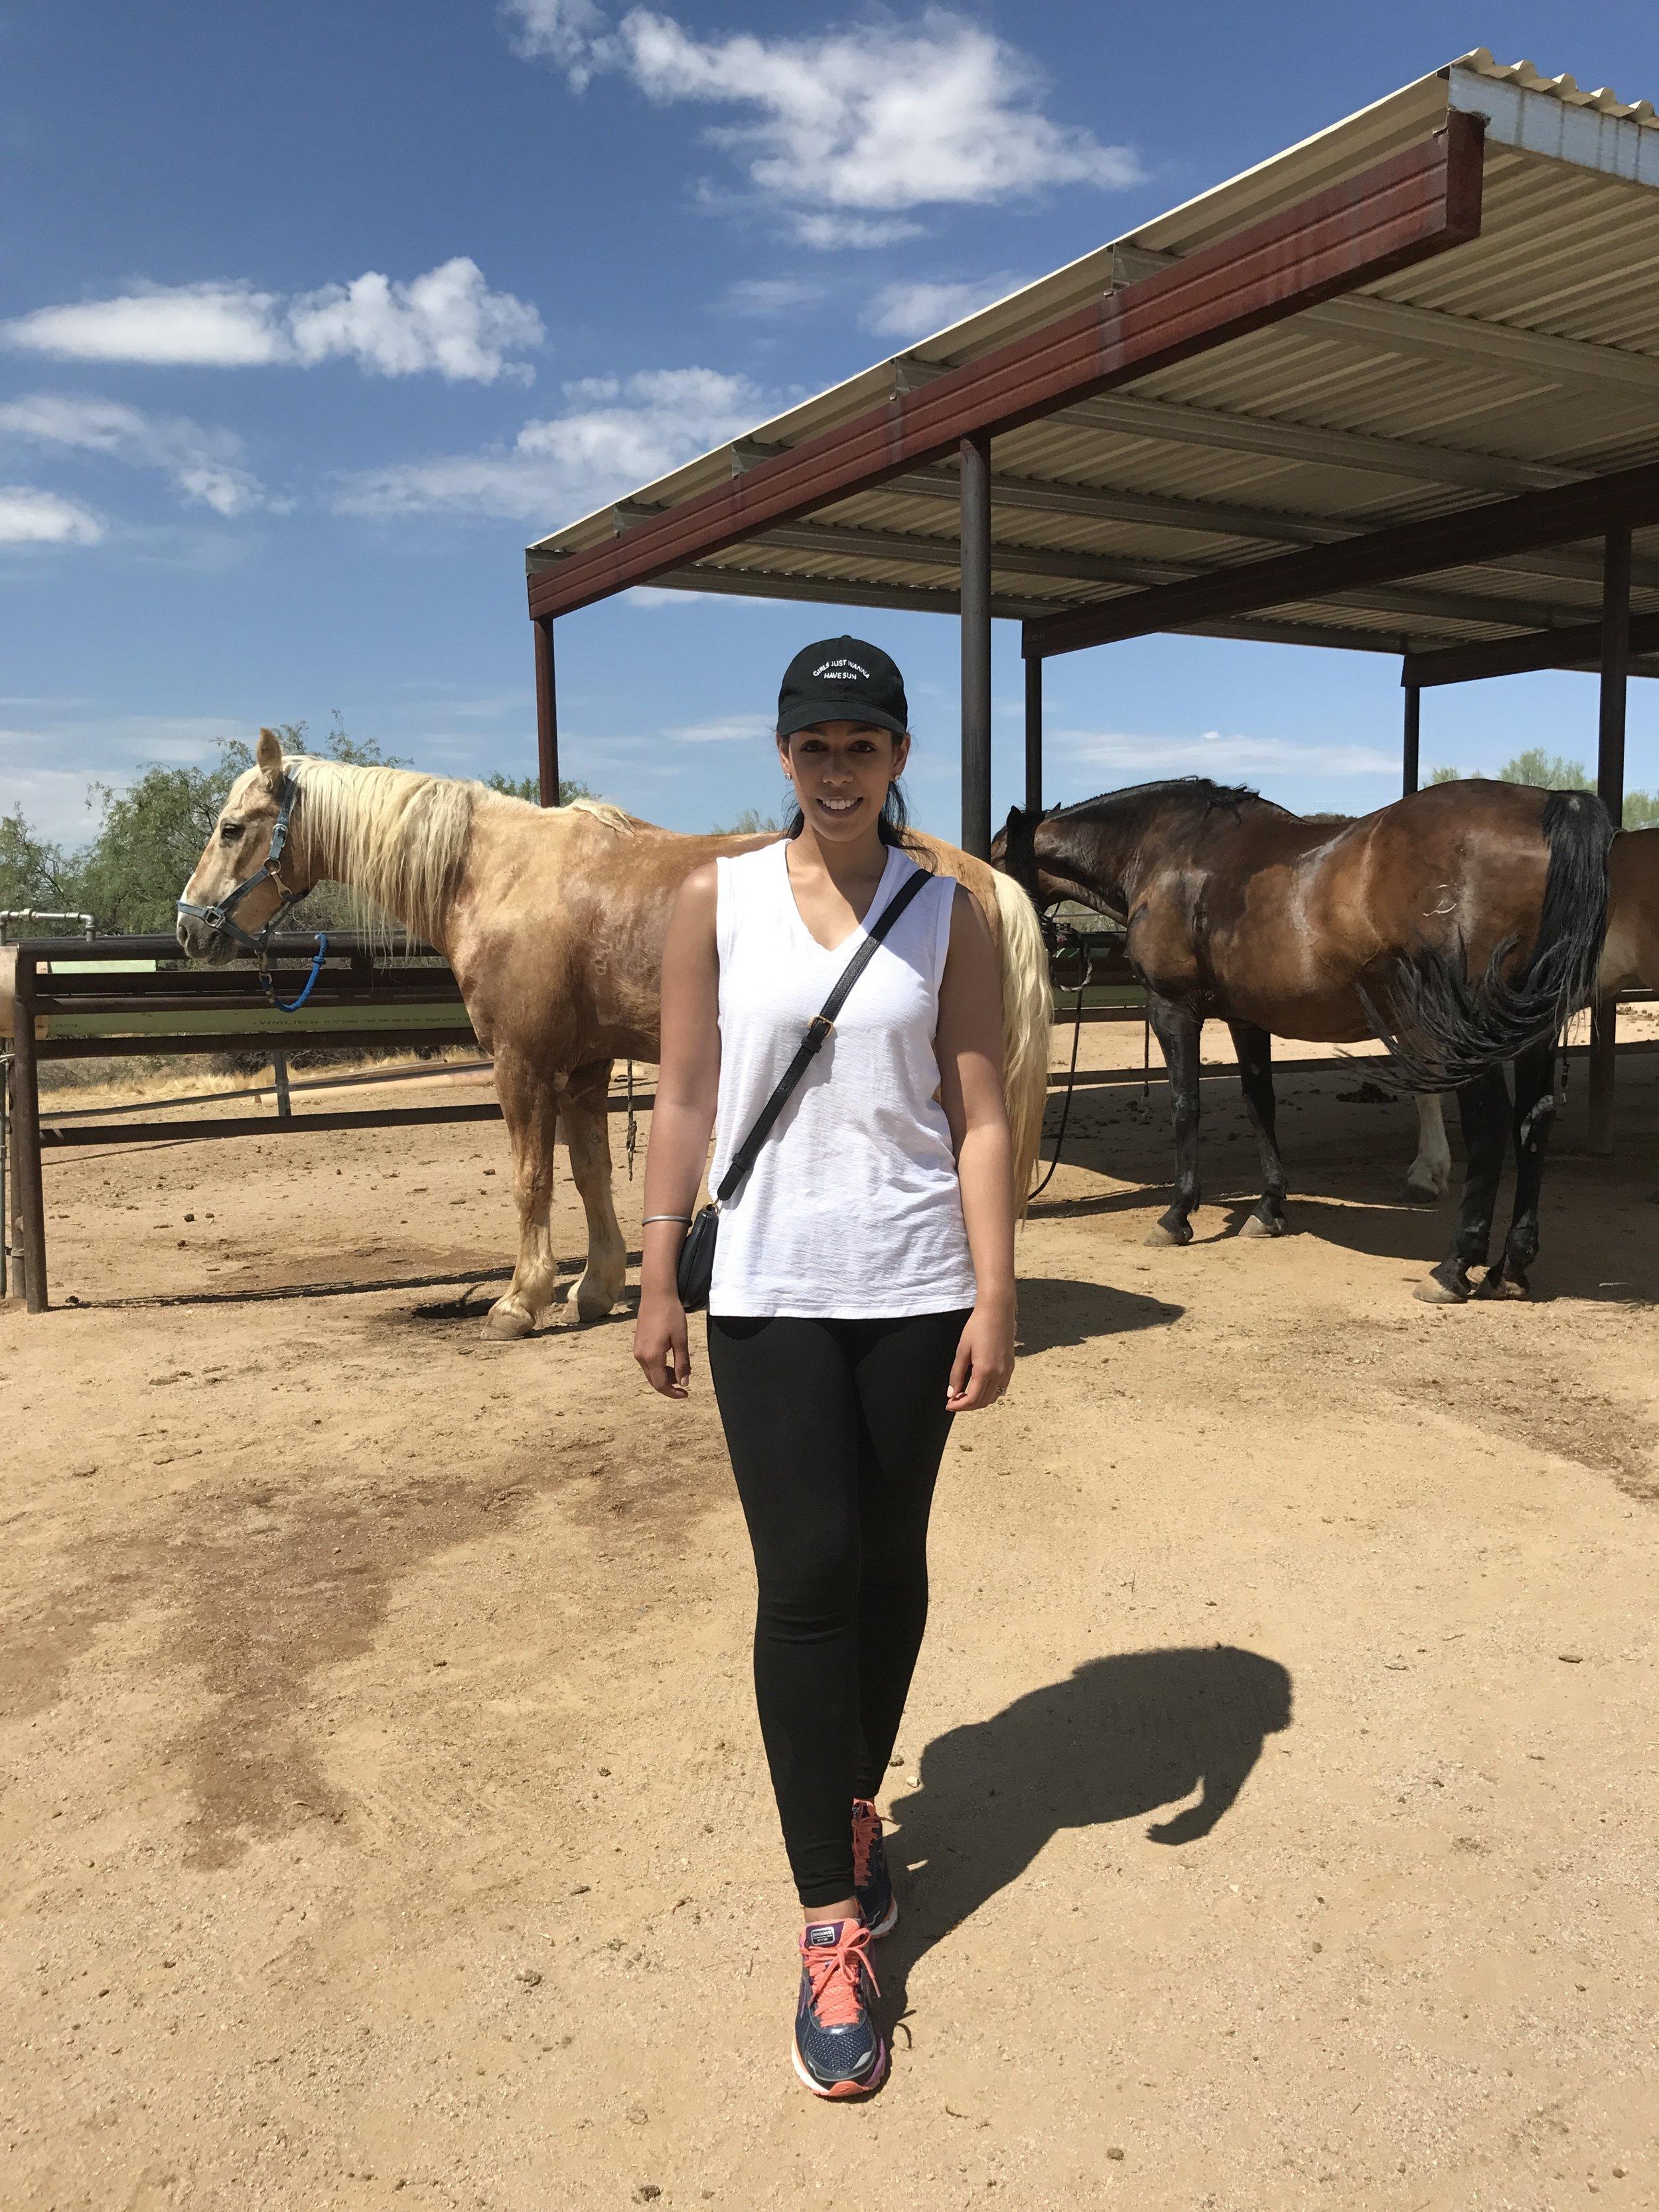 Outfit-For-Horseback-Riding.jpg